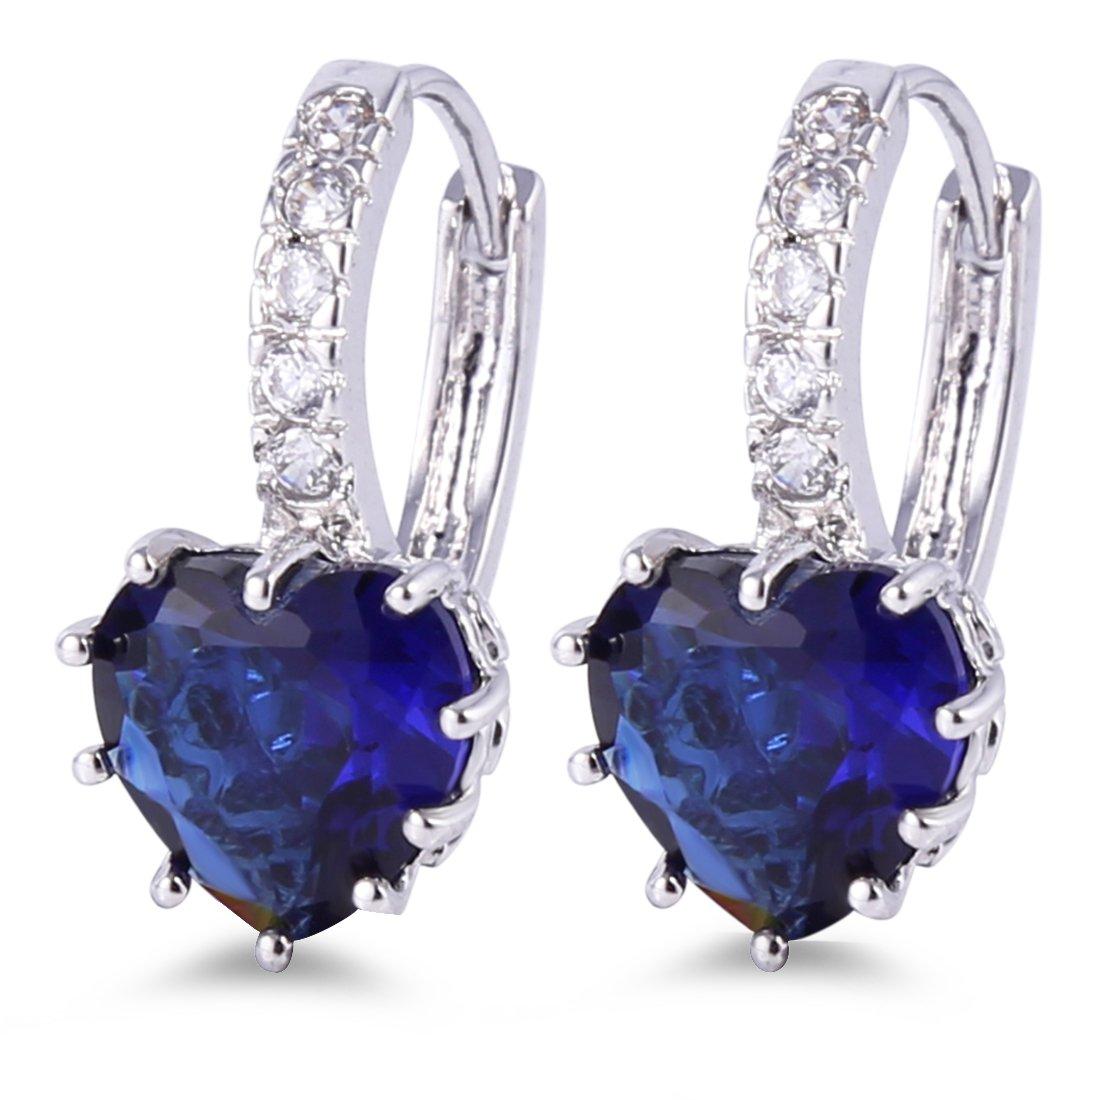 GULICX White Gold Tone Sapphire Color Blue Huggie Hoop Earrings Leverback Heart Shape Women Girls